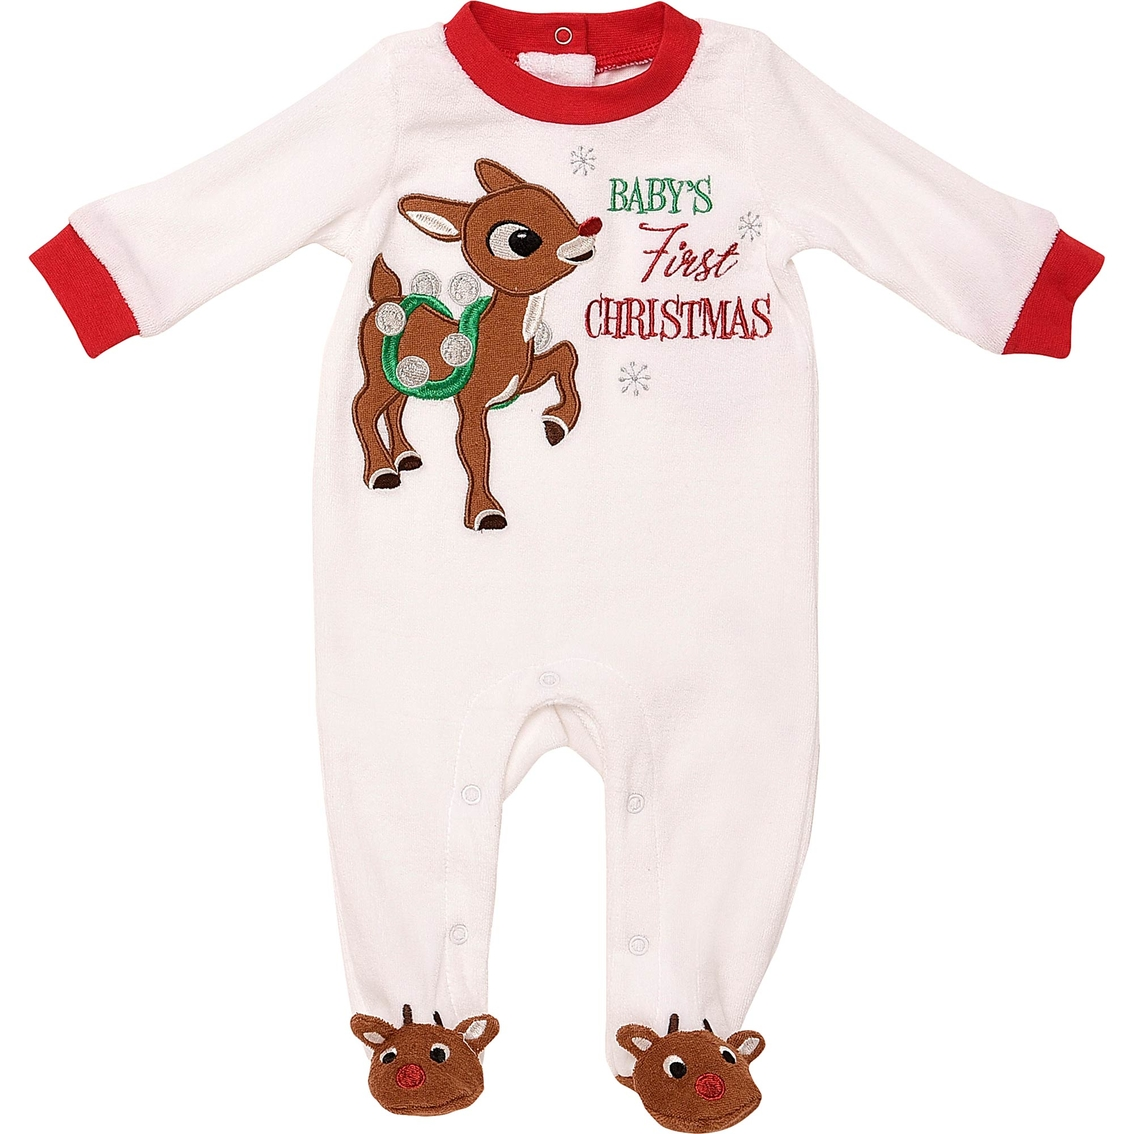 CREAM BABY VESTS Girl Boy Newborn Birth New Novelty Dress It Up Craft Buttons